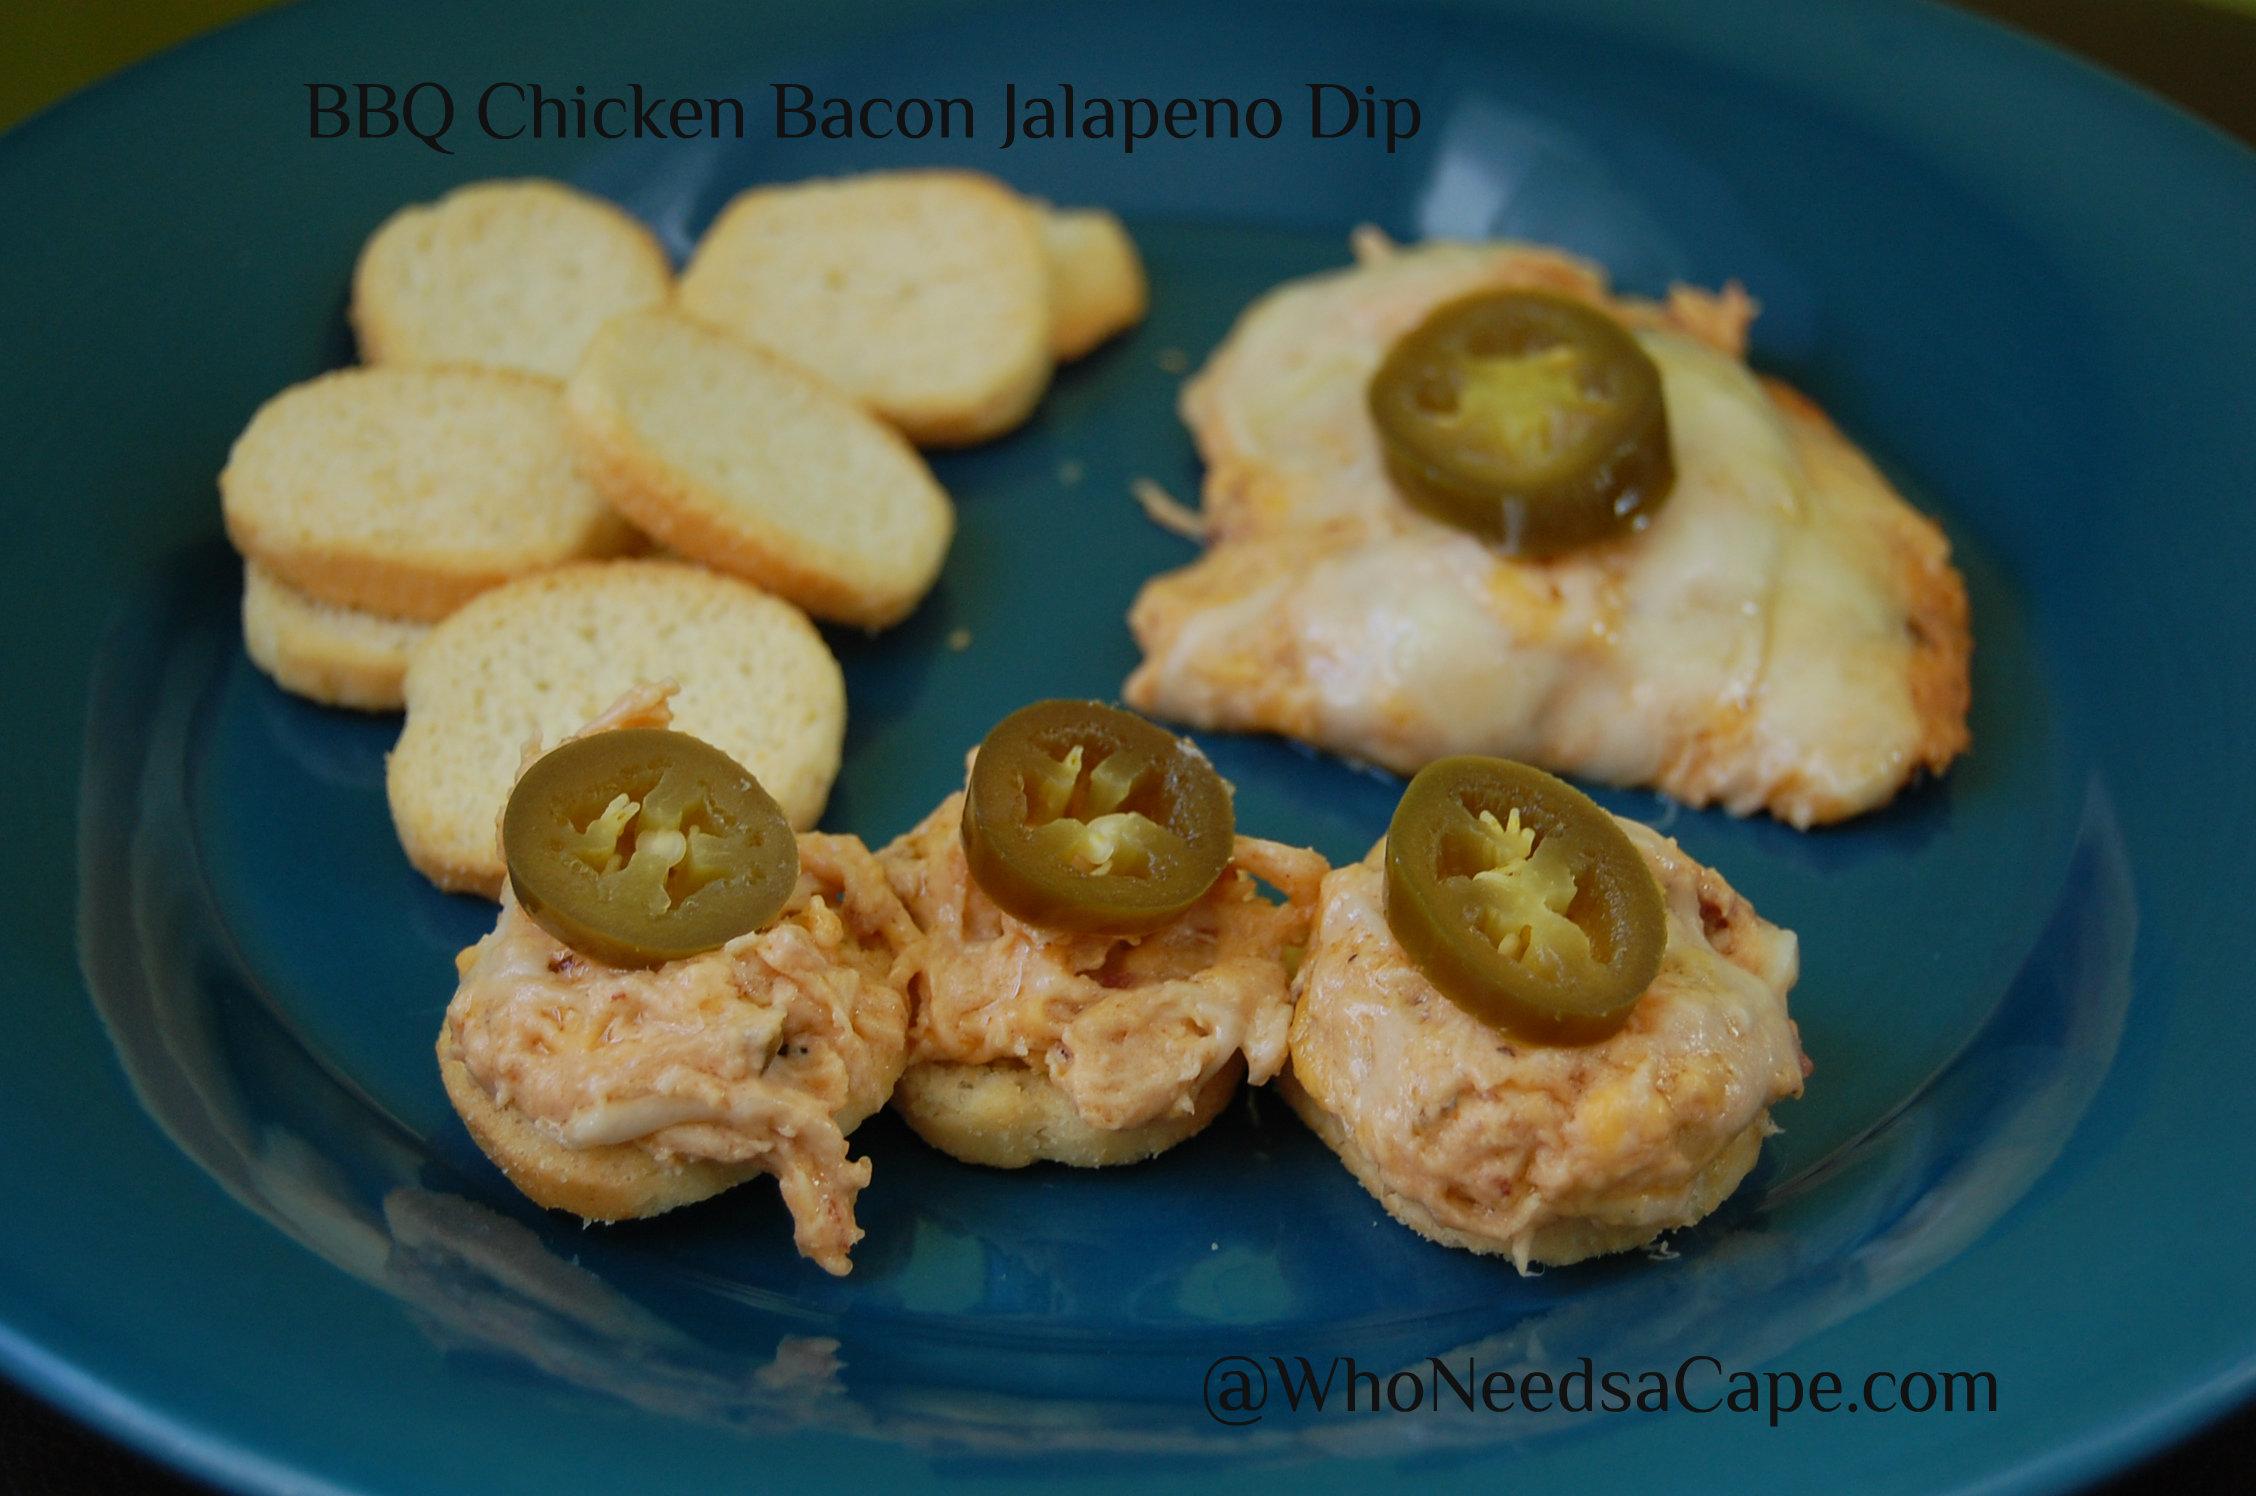 BBQ Chicken Bacon Jalapeno Dip